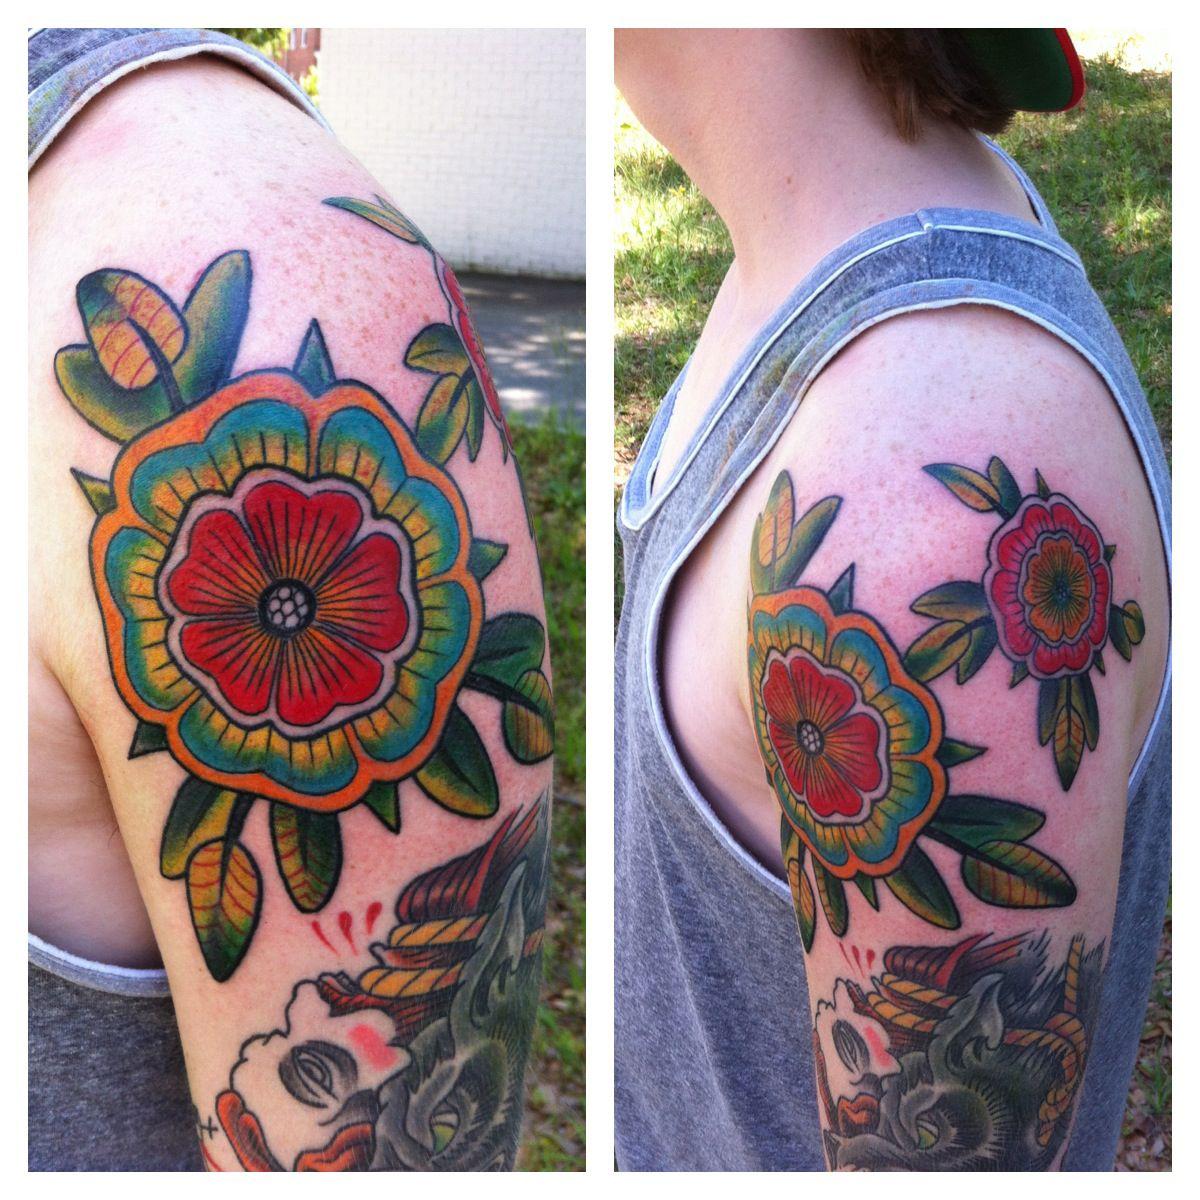 cactus flower tattoo google search tattoos pinterest cactus rh pinterest ca cactus flower tattoo black and white saguaro cactus flower tattoo